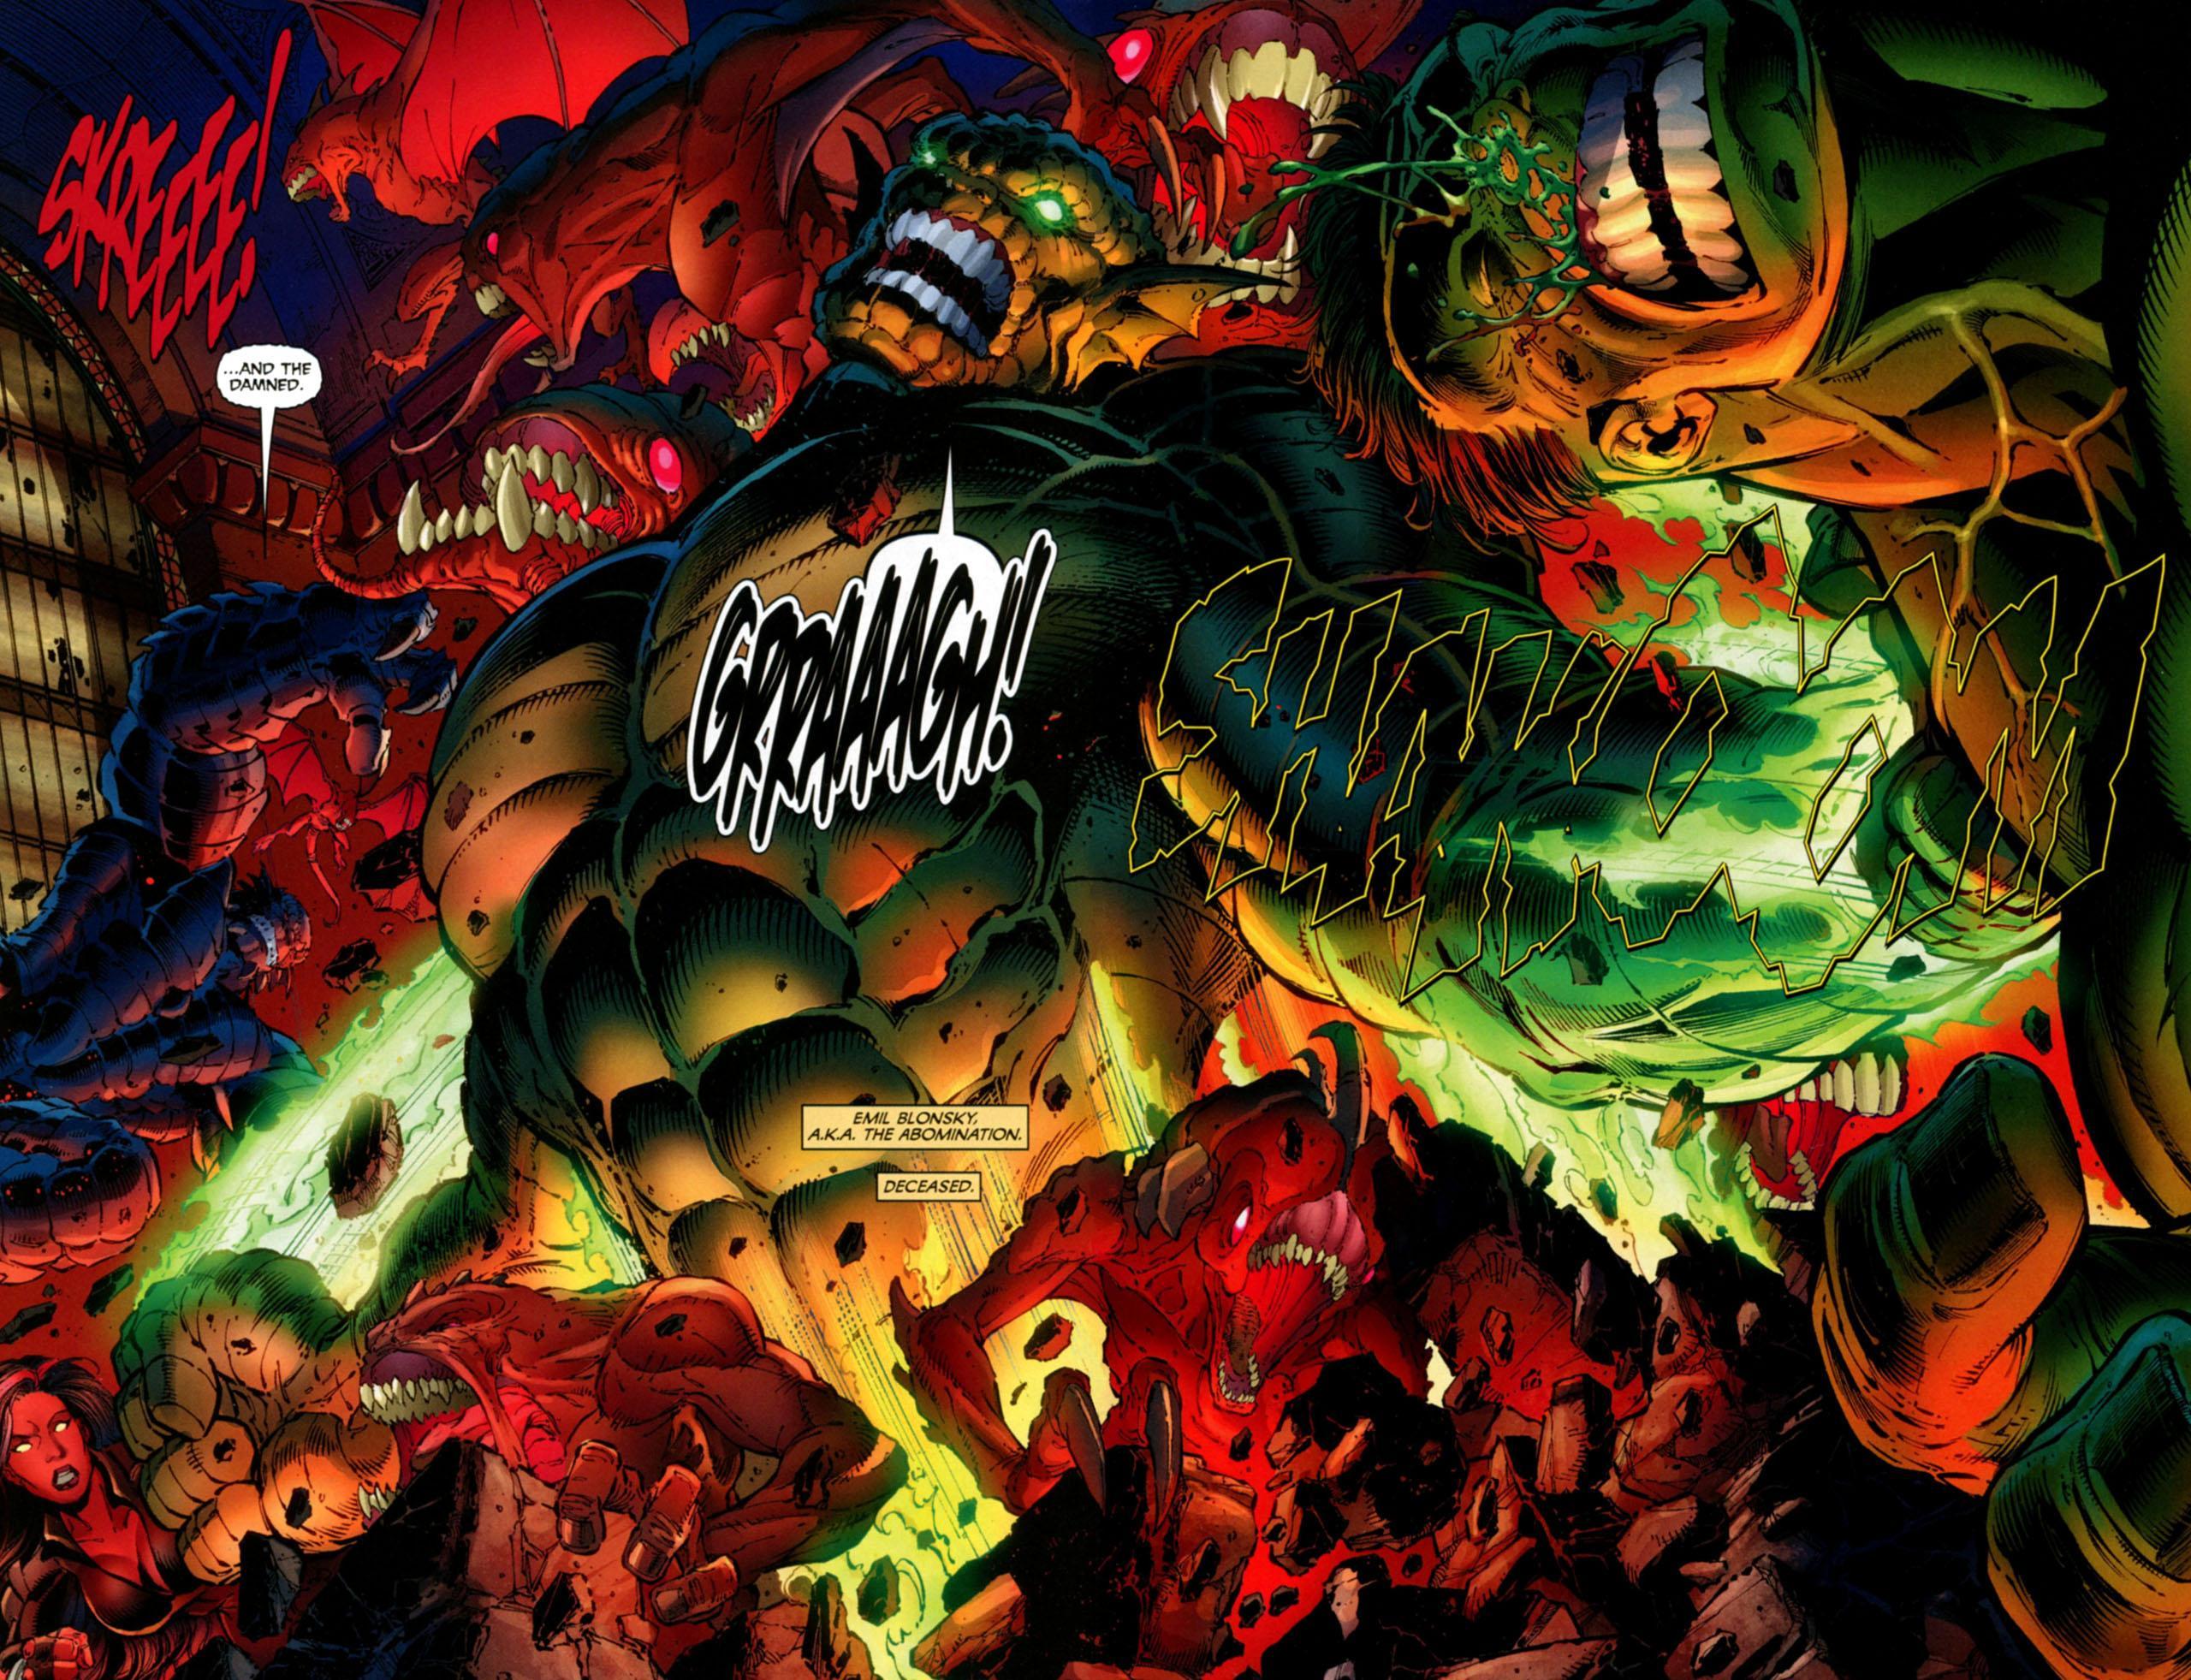 The Incredible Hulks Chaos War review